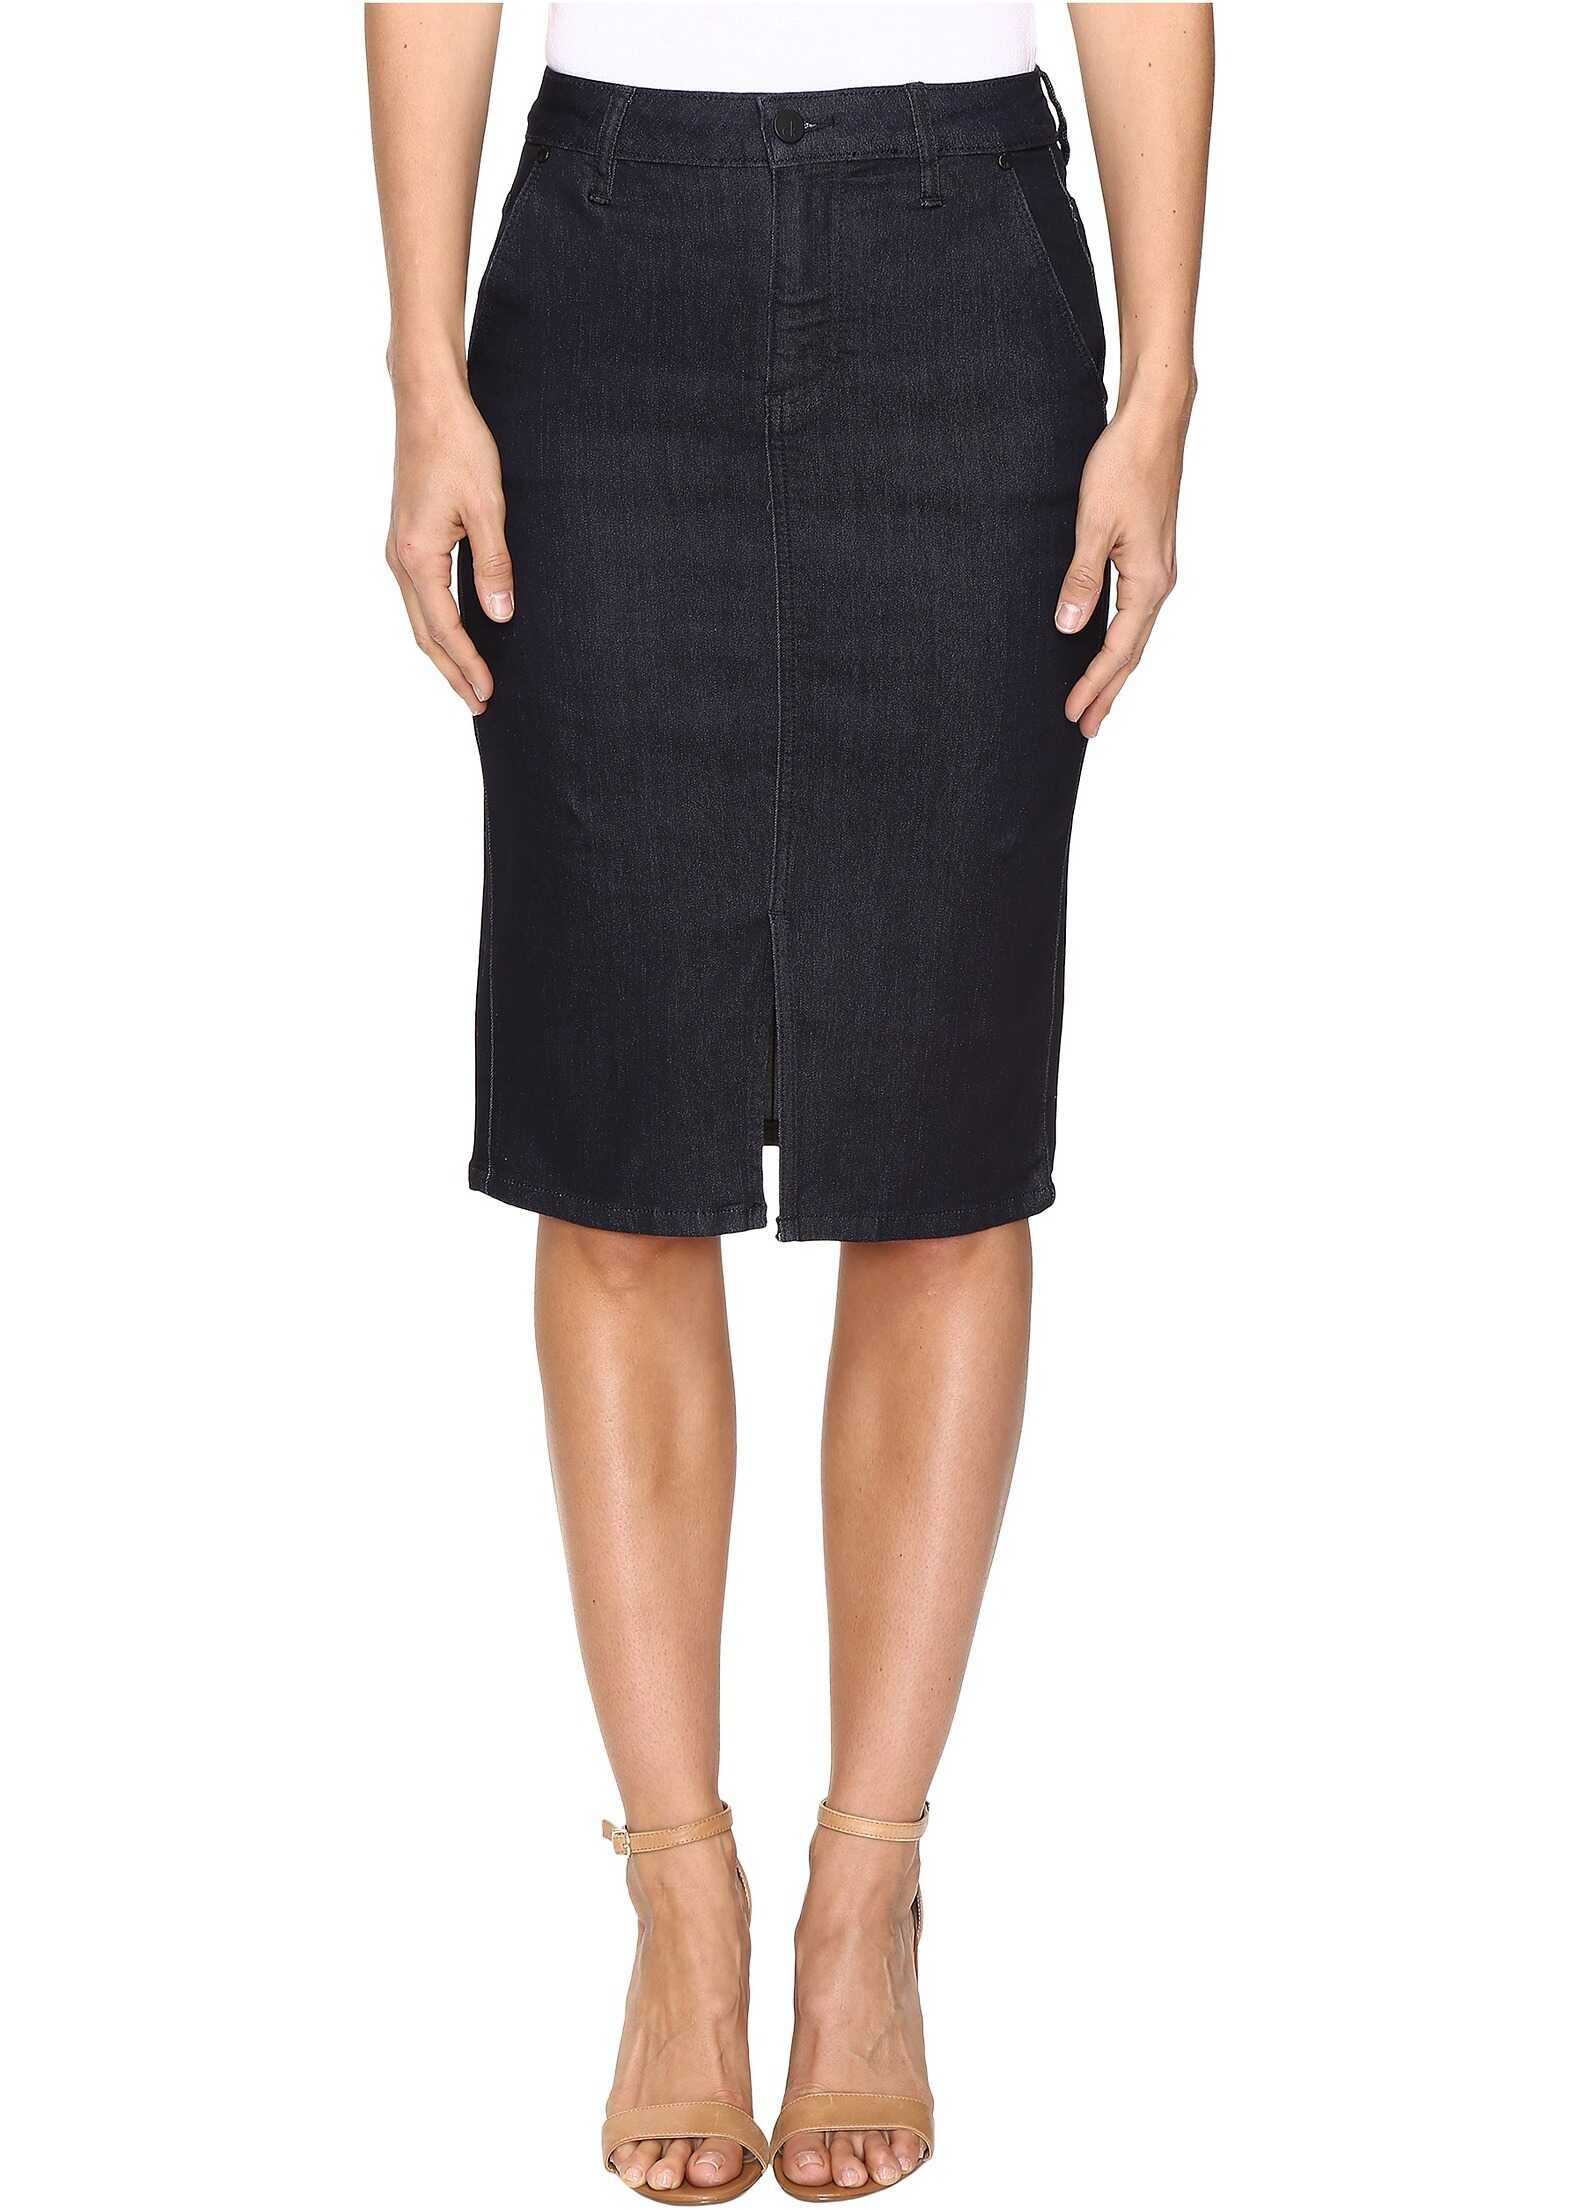 Fusta Femei Calvin Klein Jeans Pencil Skirt Rinse